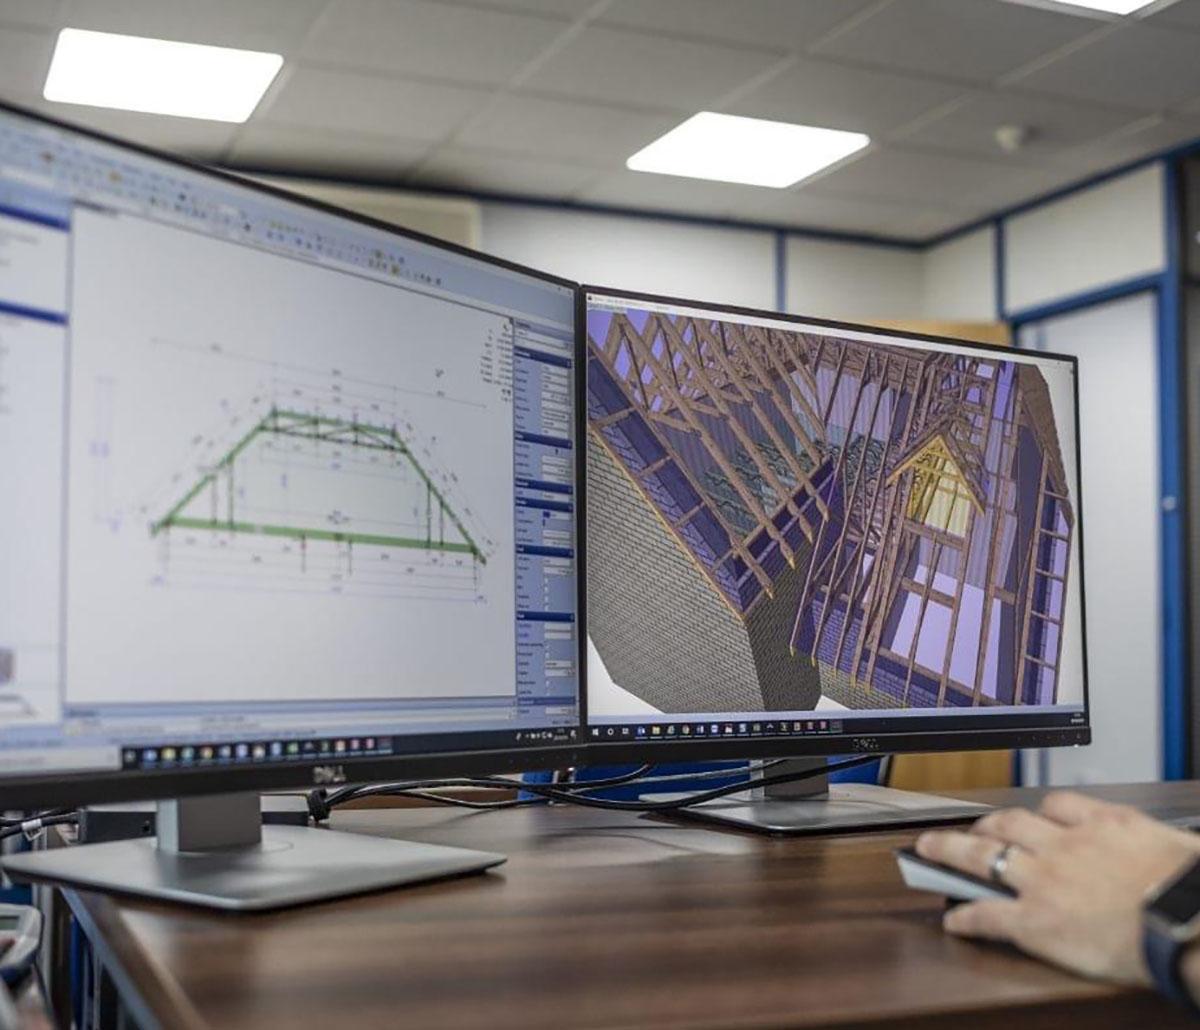 MiTek Prefabrication Component Design Services - Person sitting at desk with computer working on design software